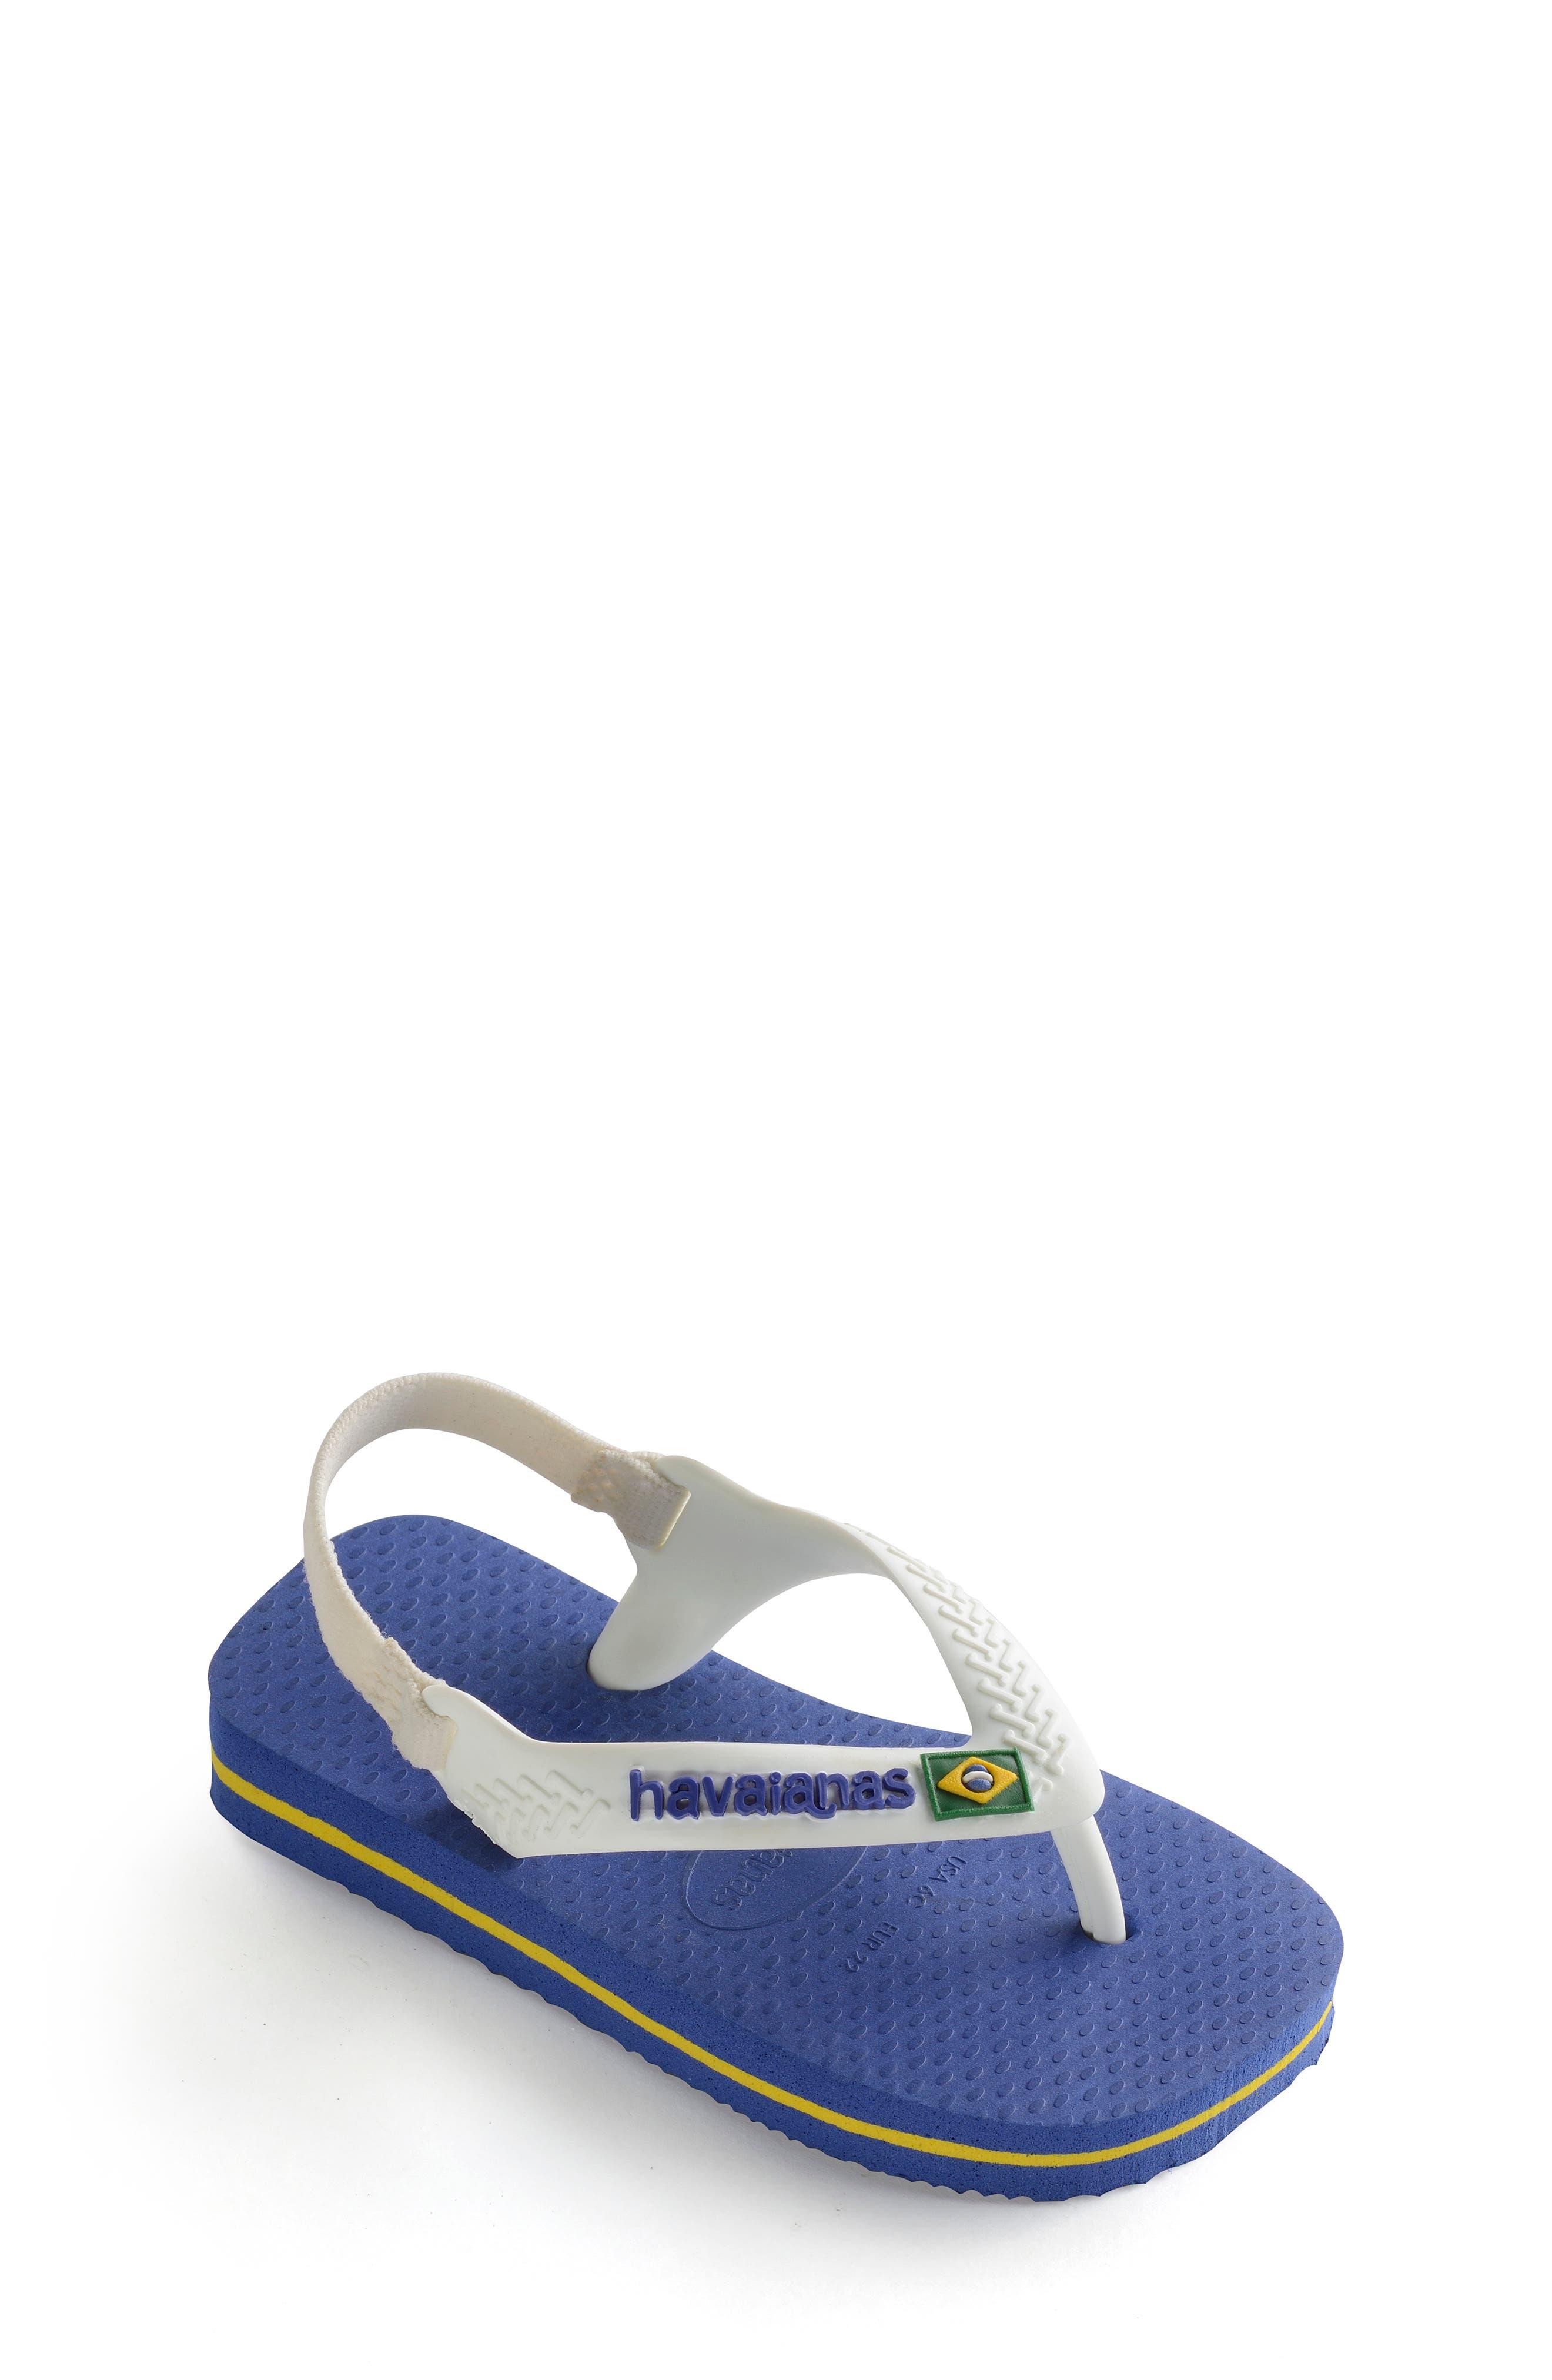 4e279f3ca All Kids  Havaianas   Baby Sandals   Flip-Flops